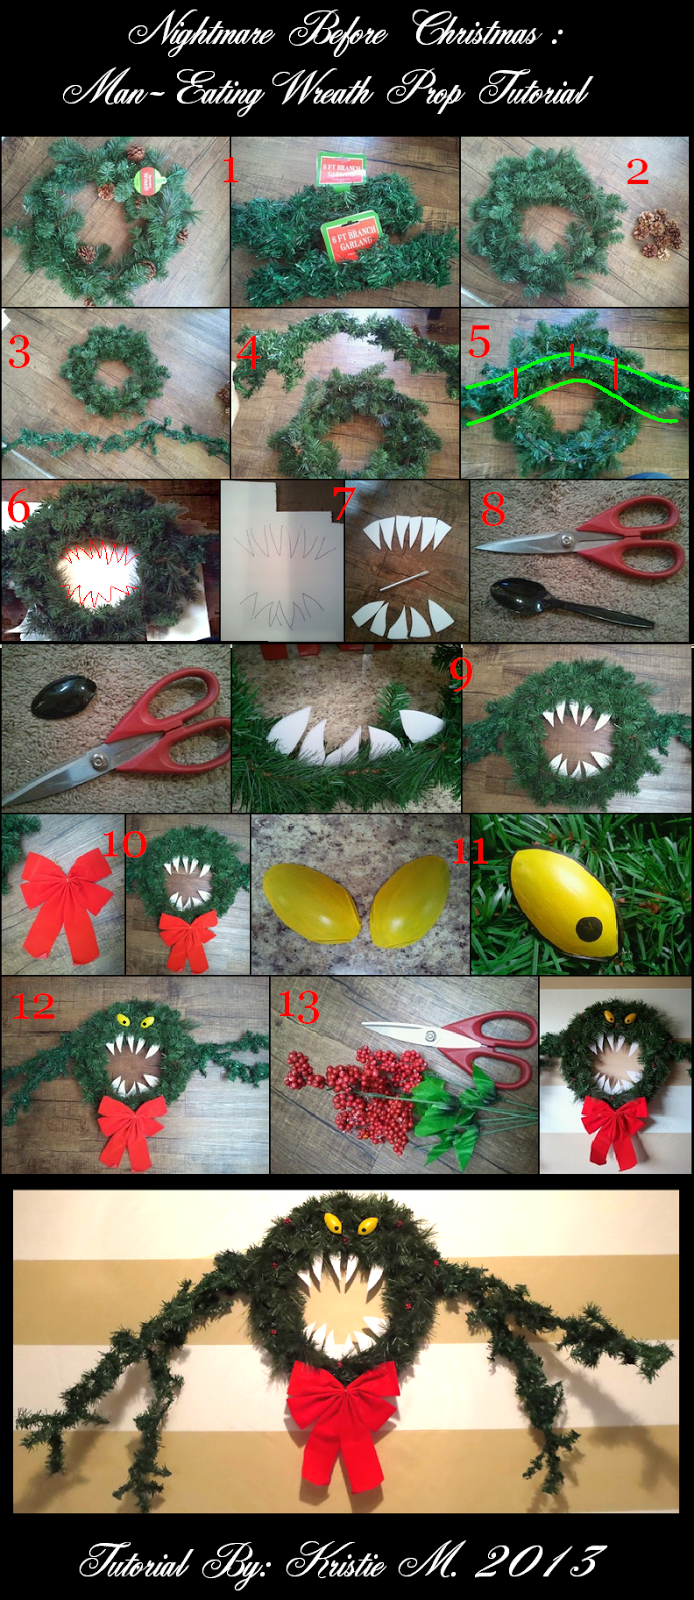 Diy Nightmare Before Christmas Wreath Diy Craft Halloween Crafts Christmas How To Tutorials Halloween Decoratio Idee Halloween Activite Manuelle Halloween Noel